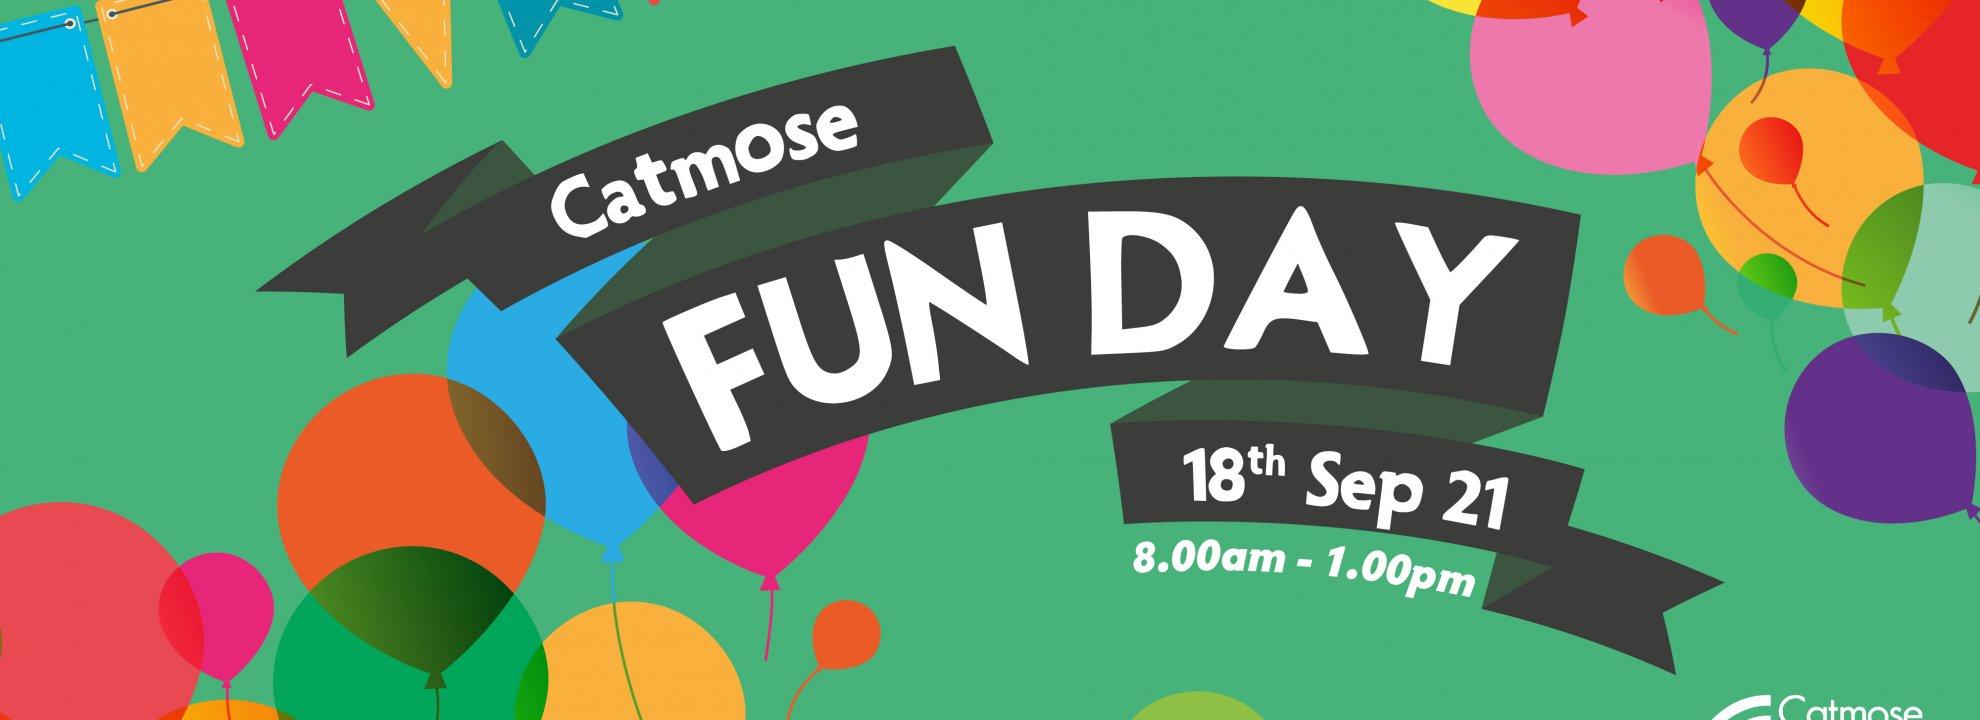 Catmose Fun Day Banner